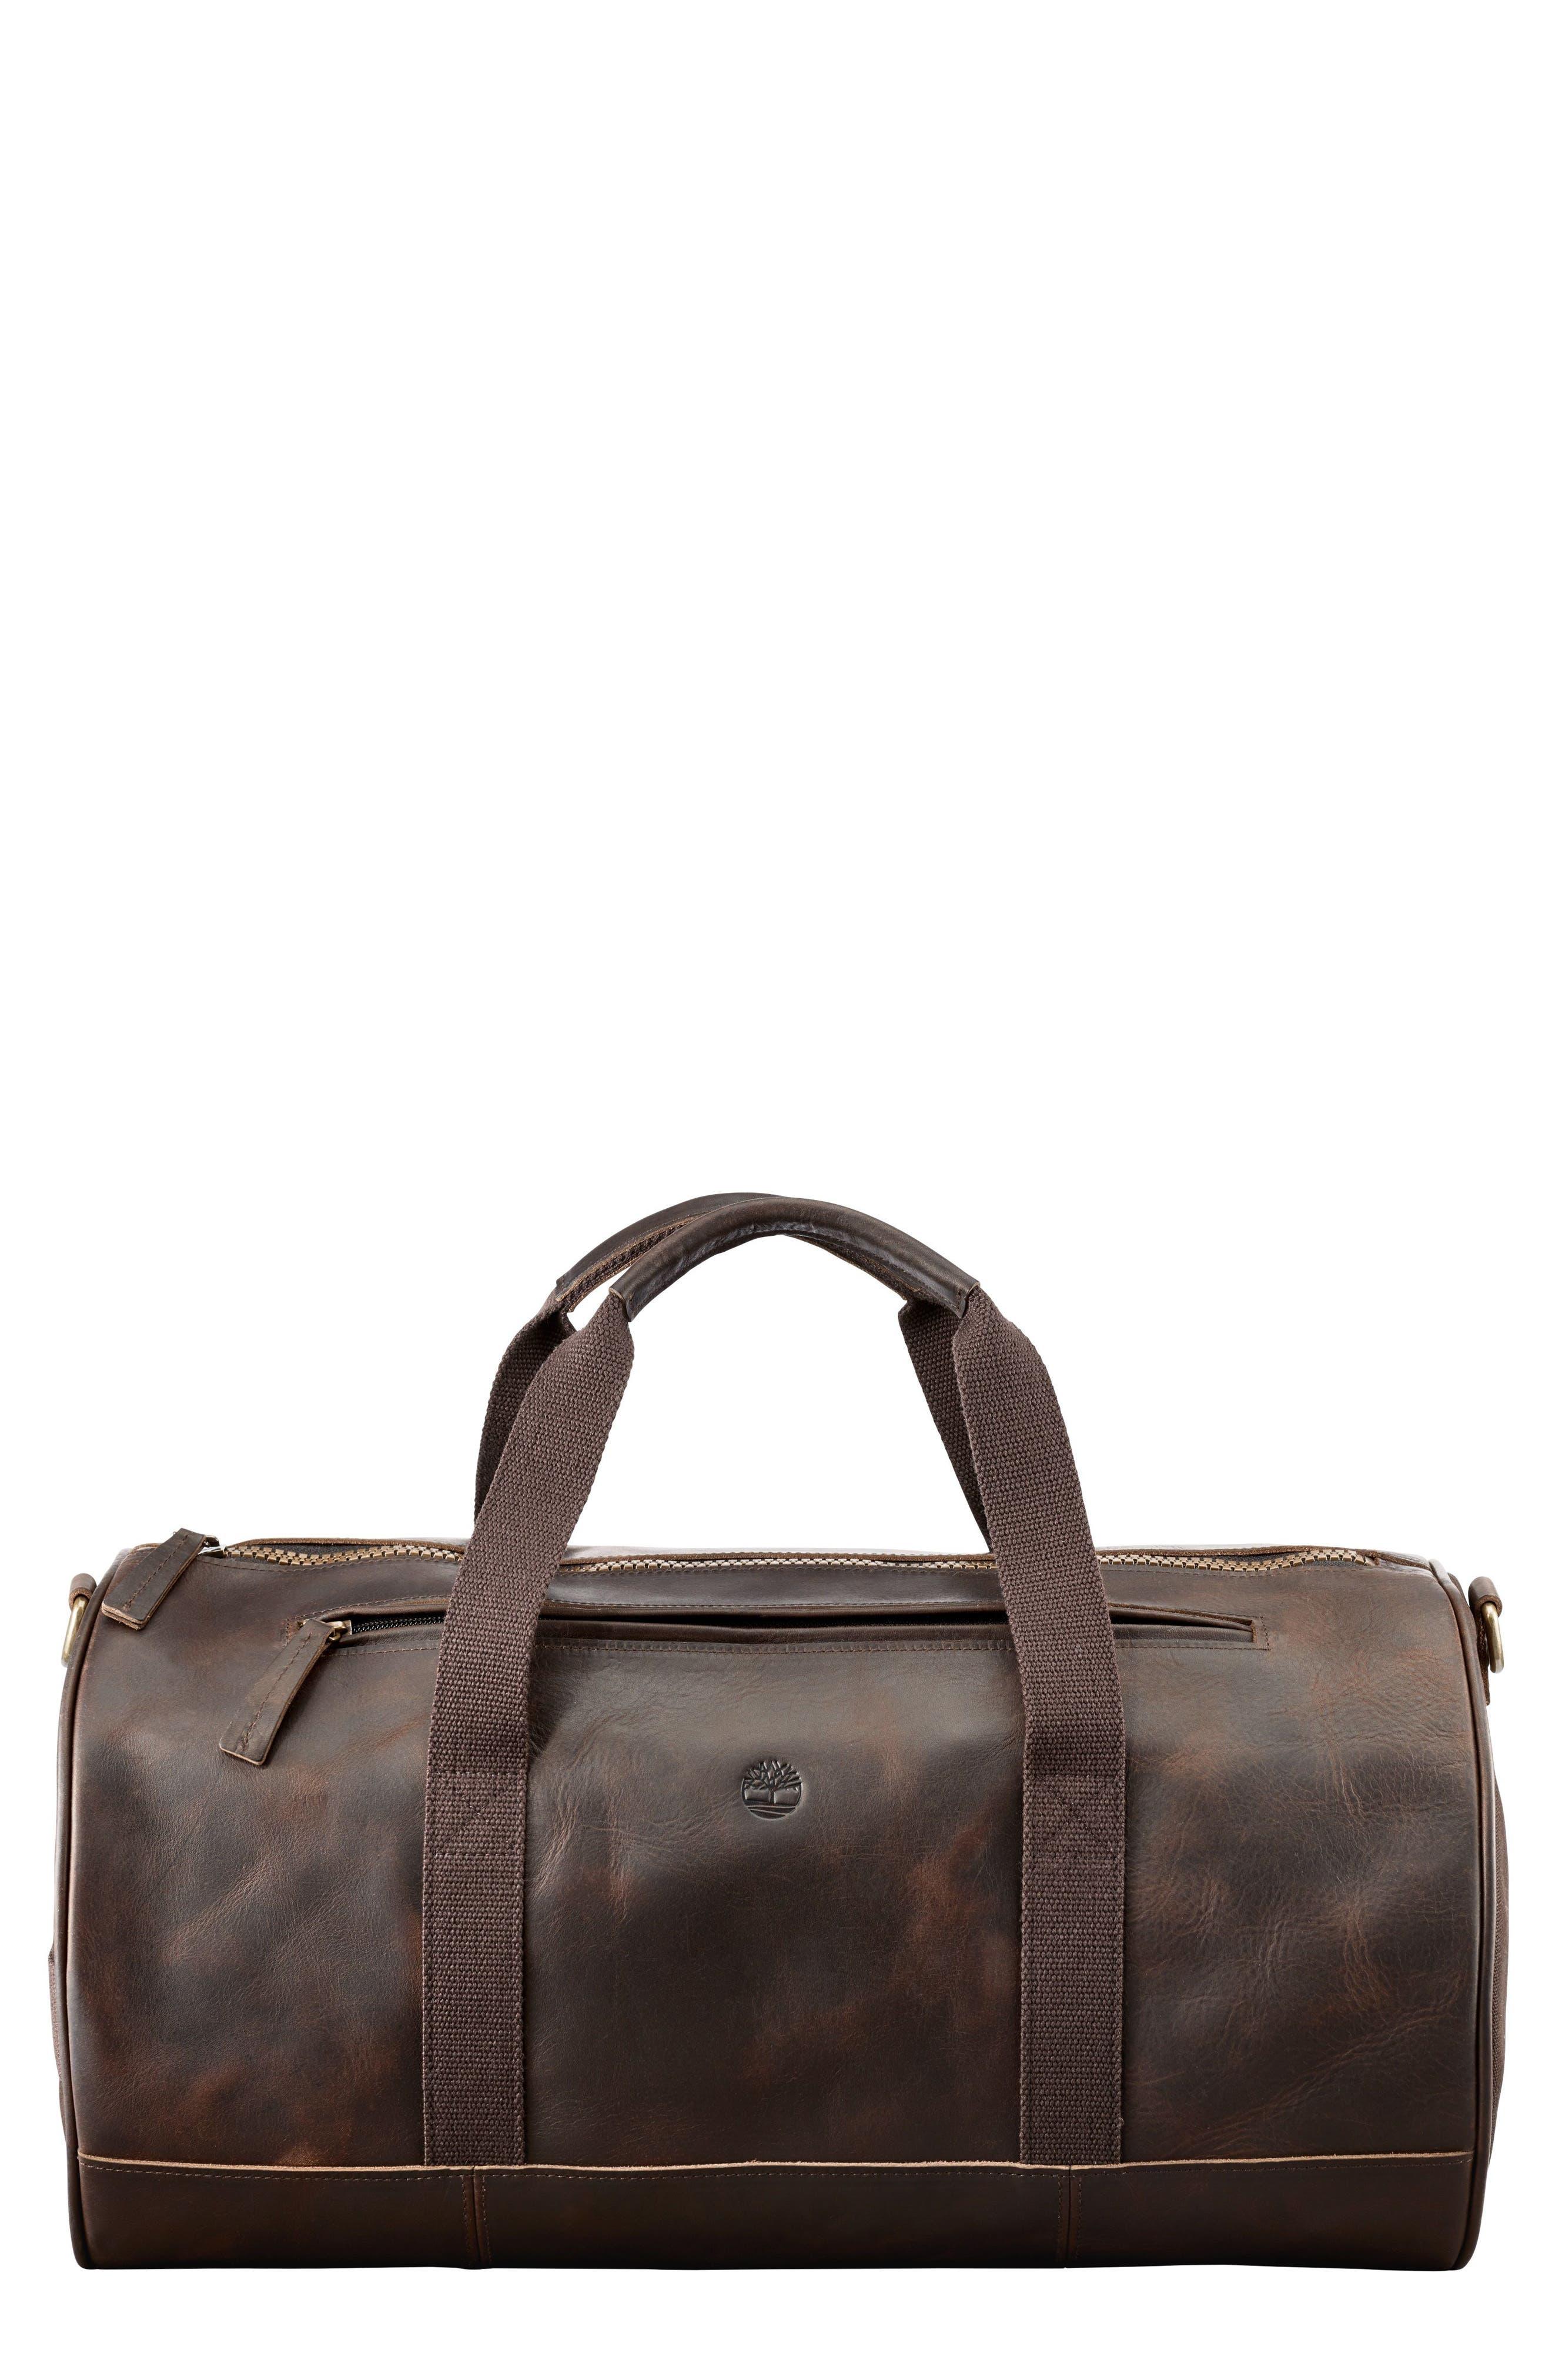 Main Image - Timberland Tuckerman Leather Duffel